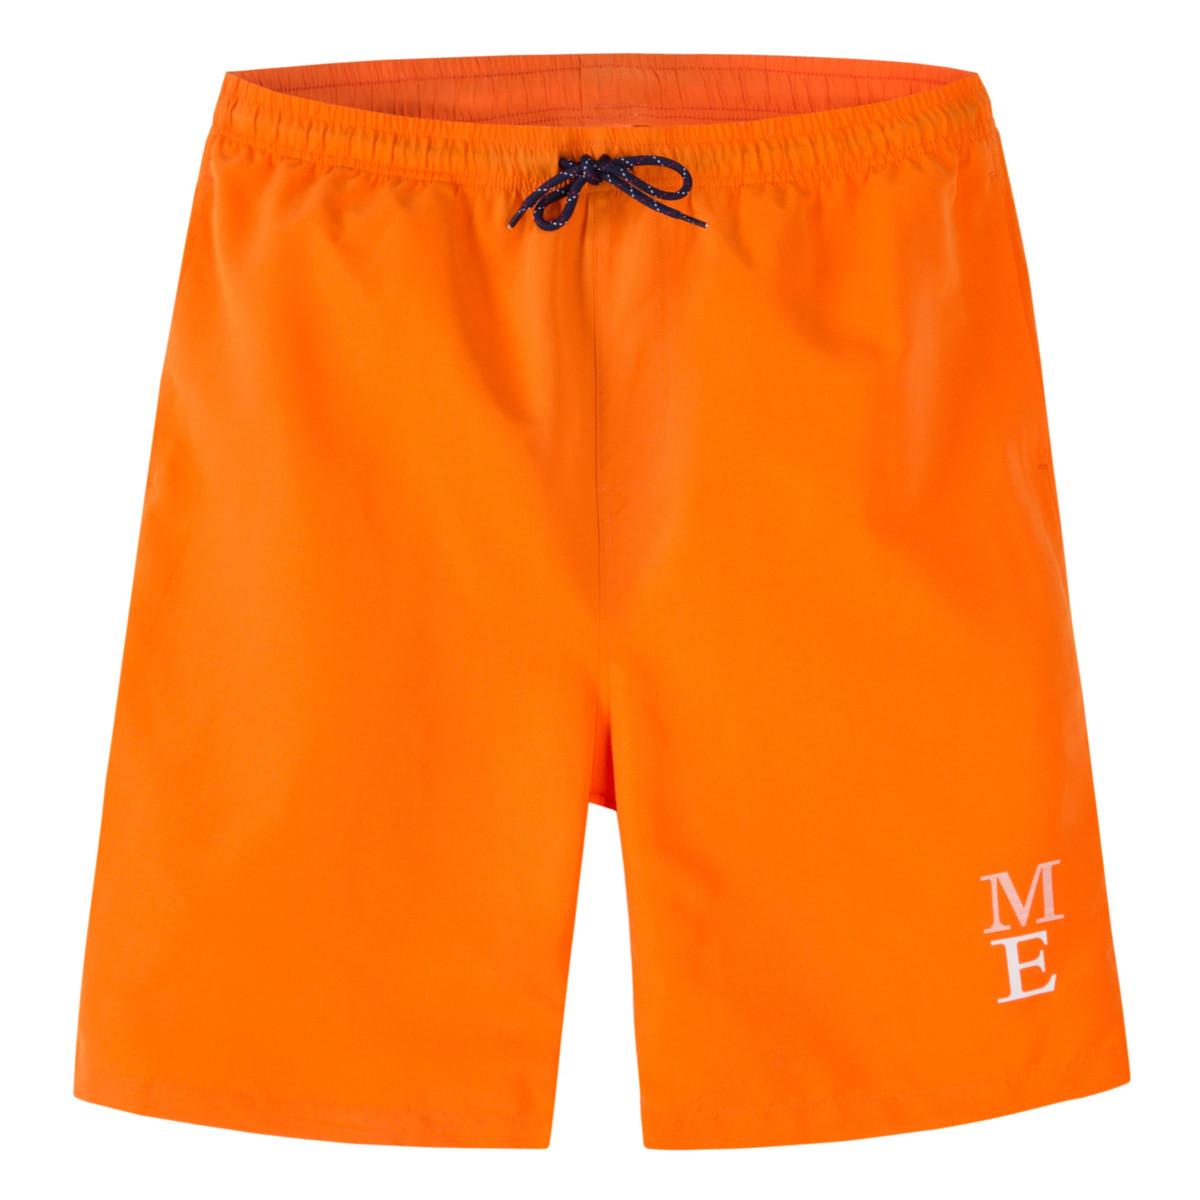 Semir 森马 森马2019夏季运动印花松紧腰宽松沙滩裤时尚休闲薄款男士短裤